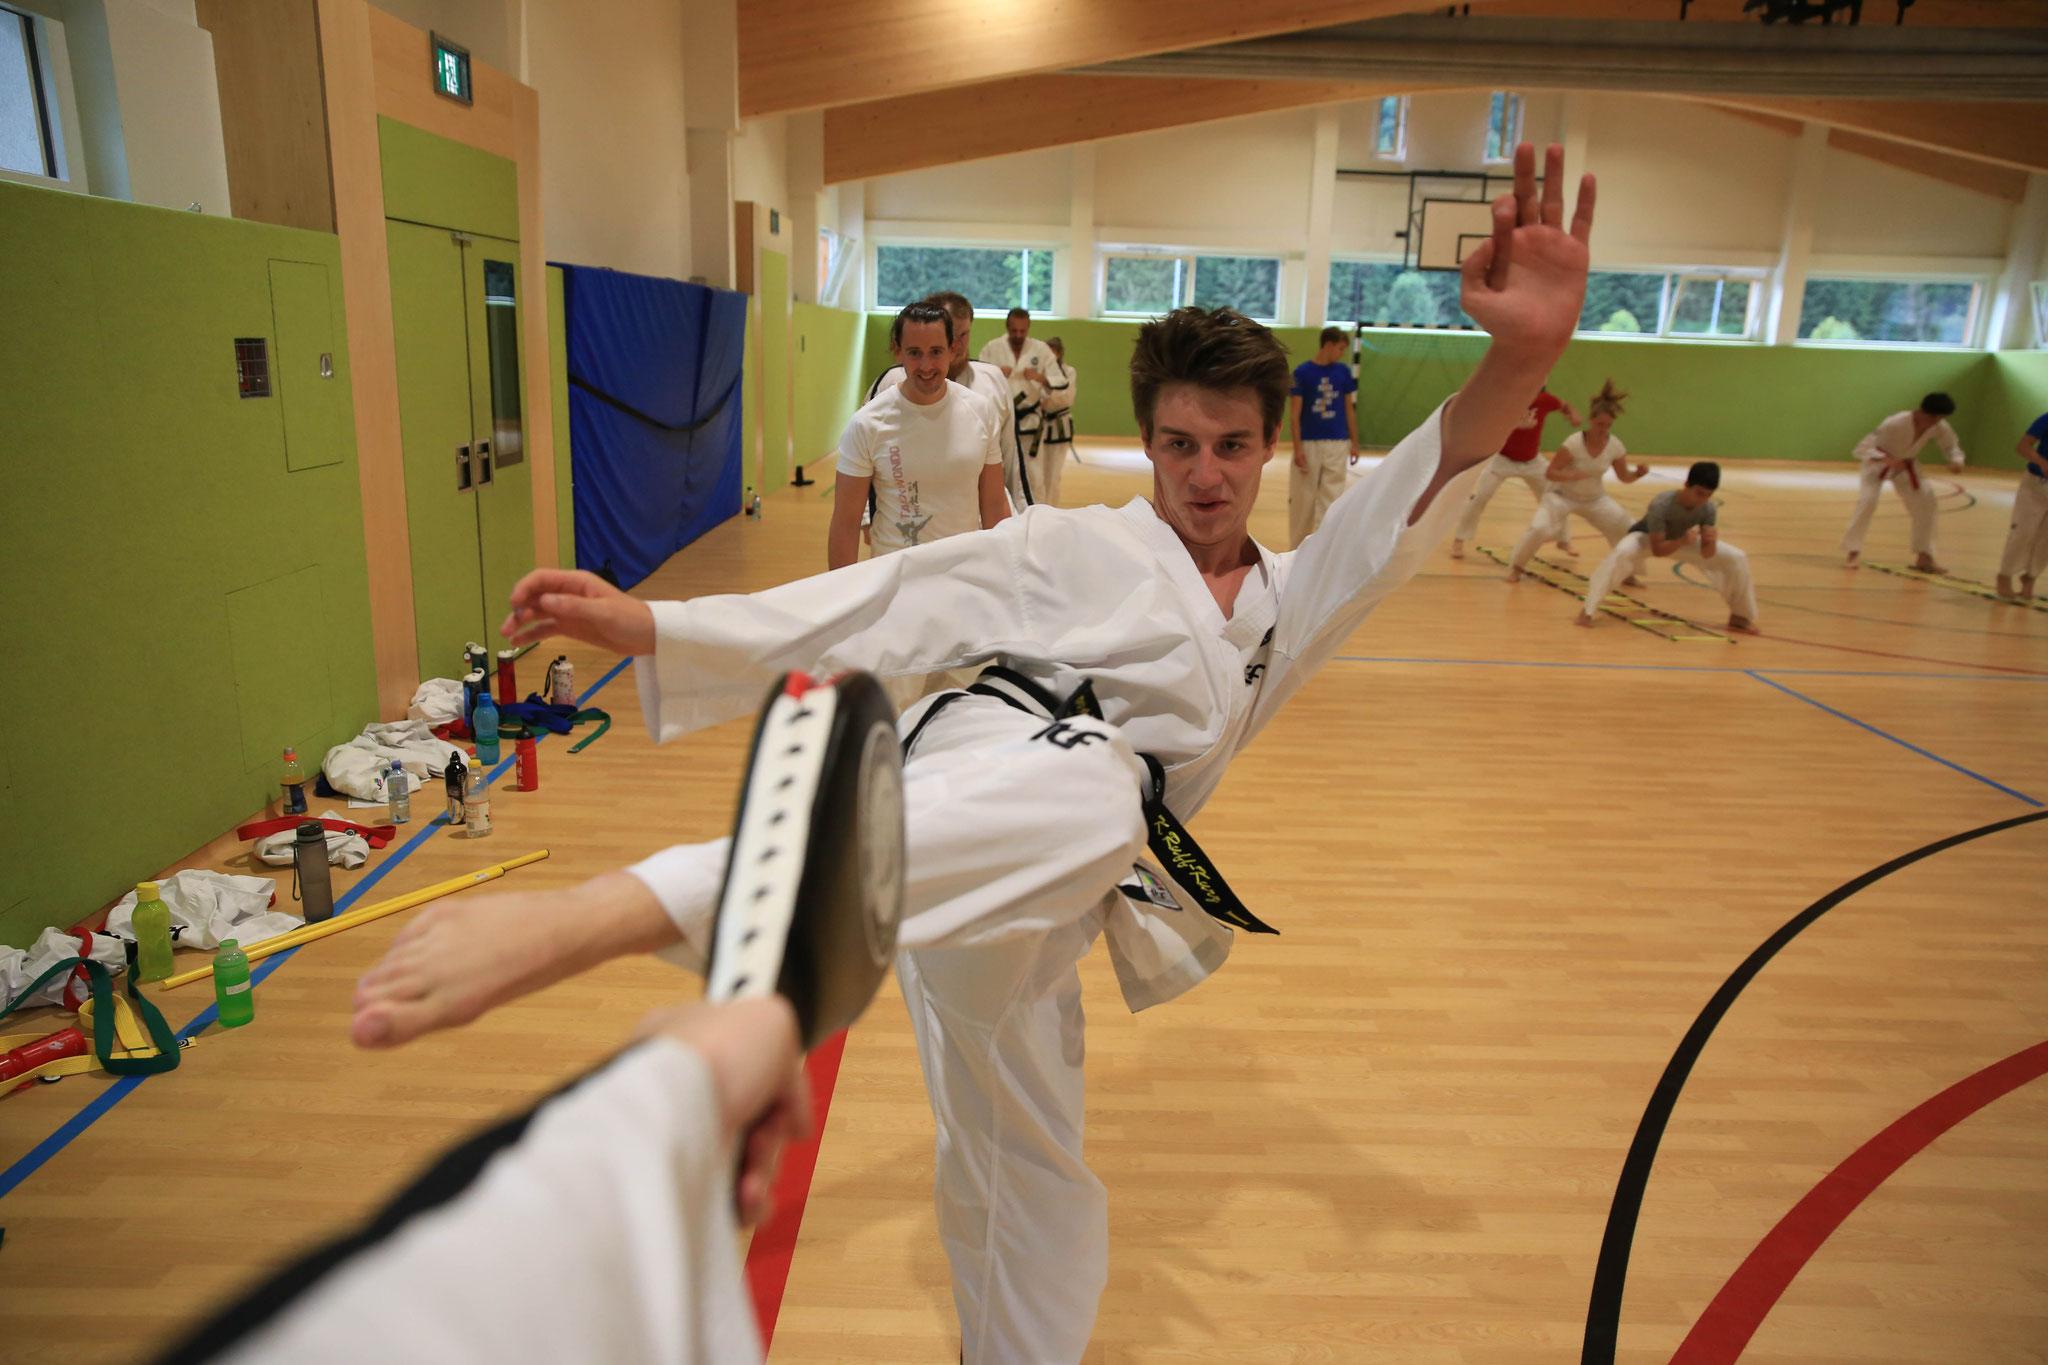 Konstantin bei der Kick Technik